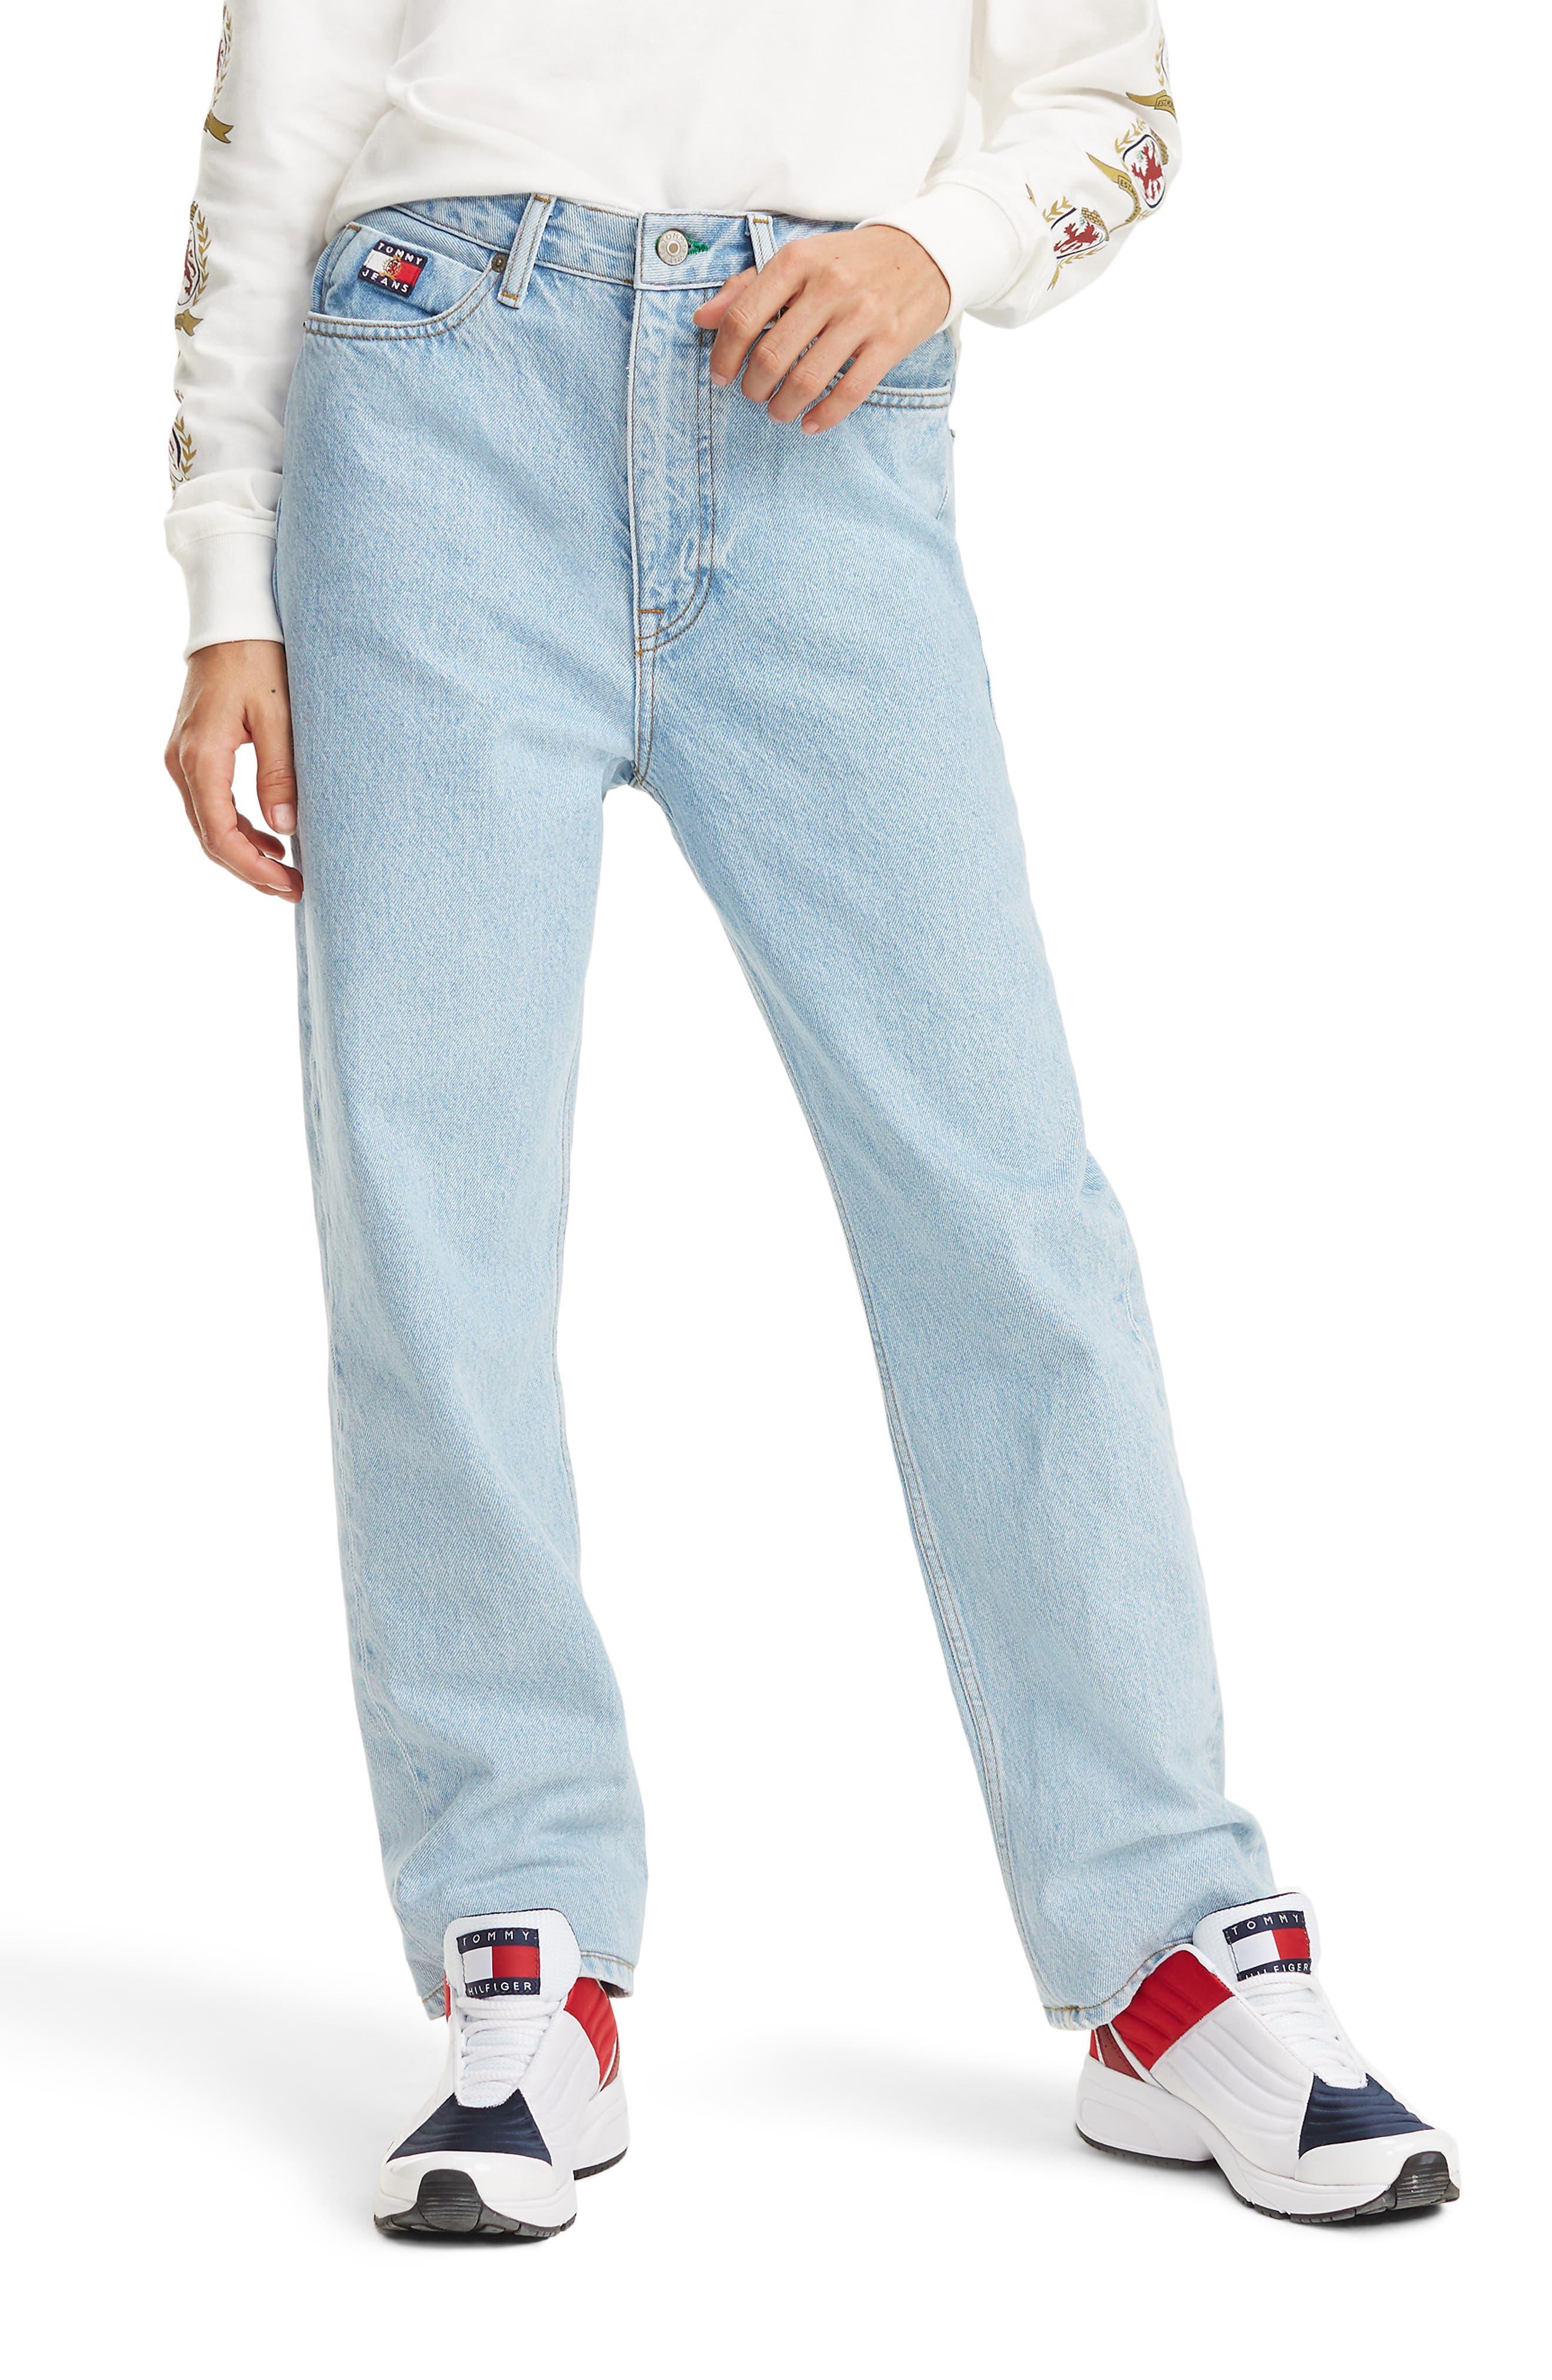 Crest Capsule Mom Jeans,                         Main,                         color, LIGHT BLUE DENIM